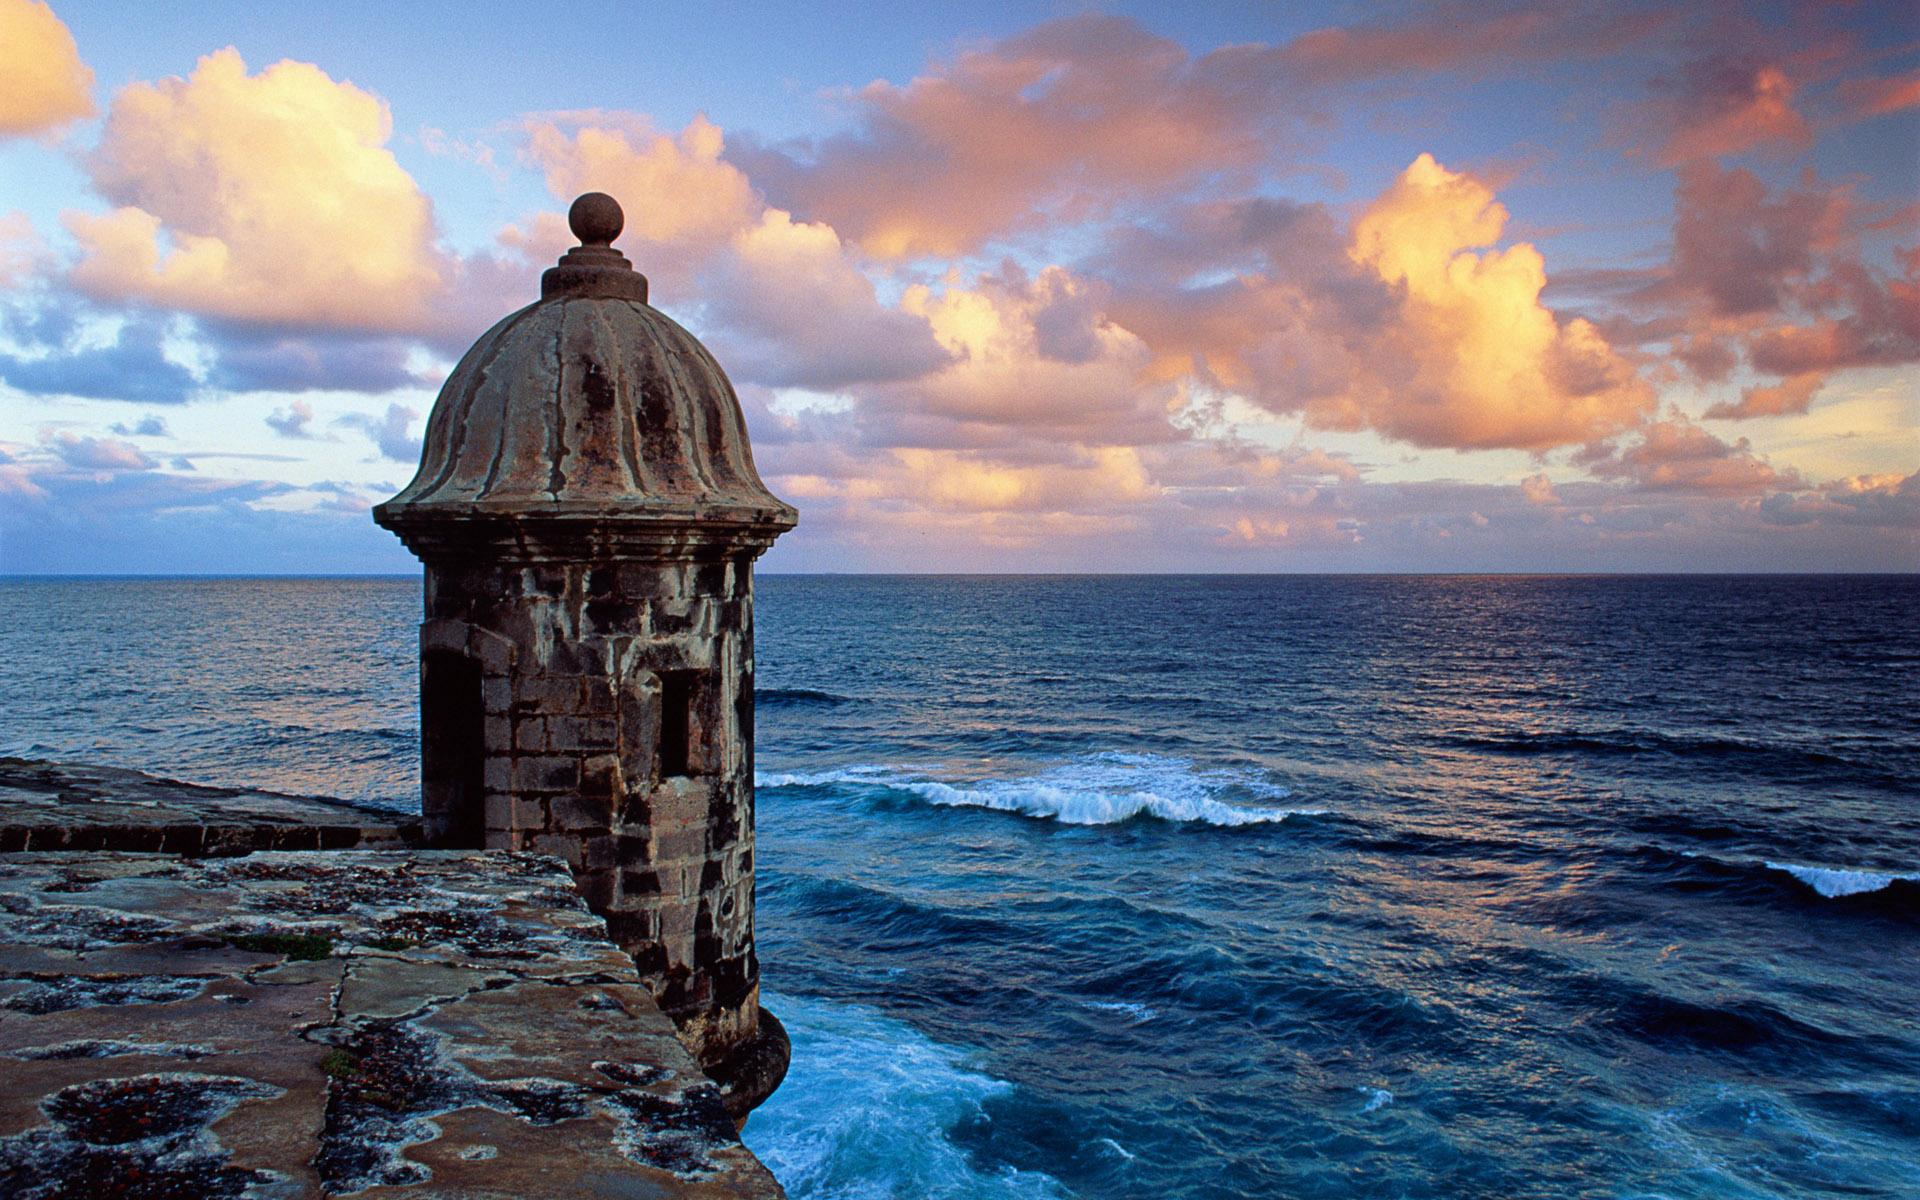 Puerto rican sights photo